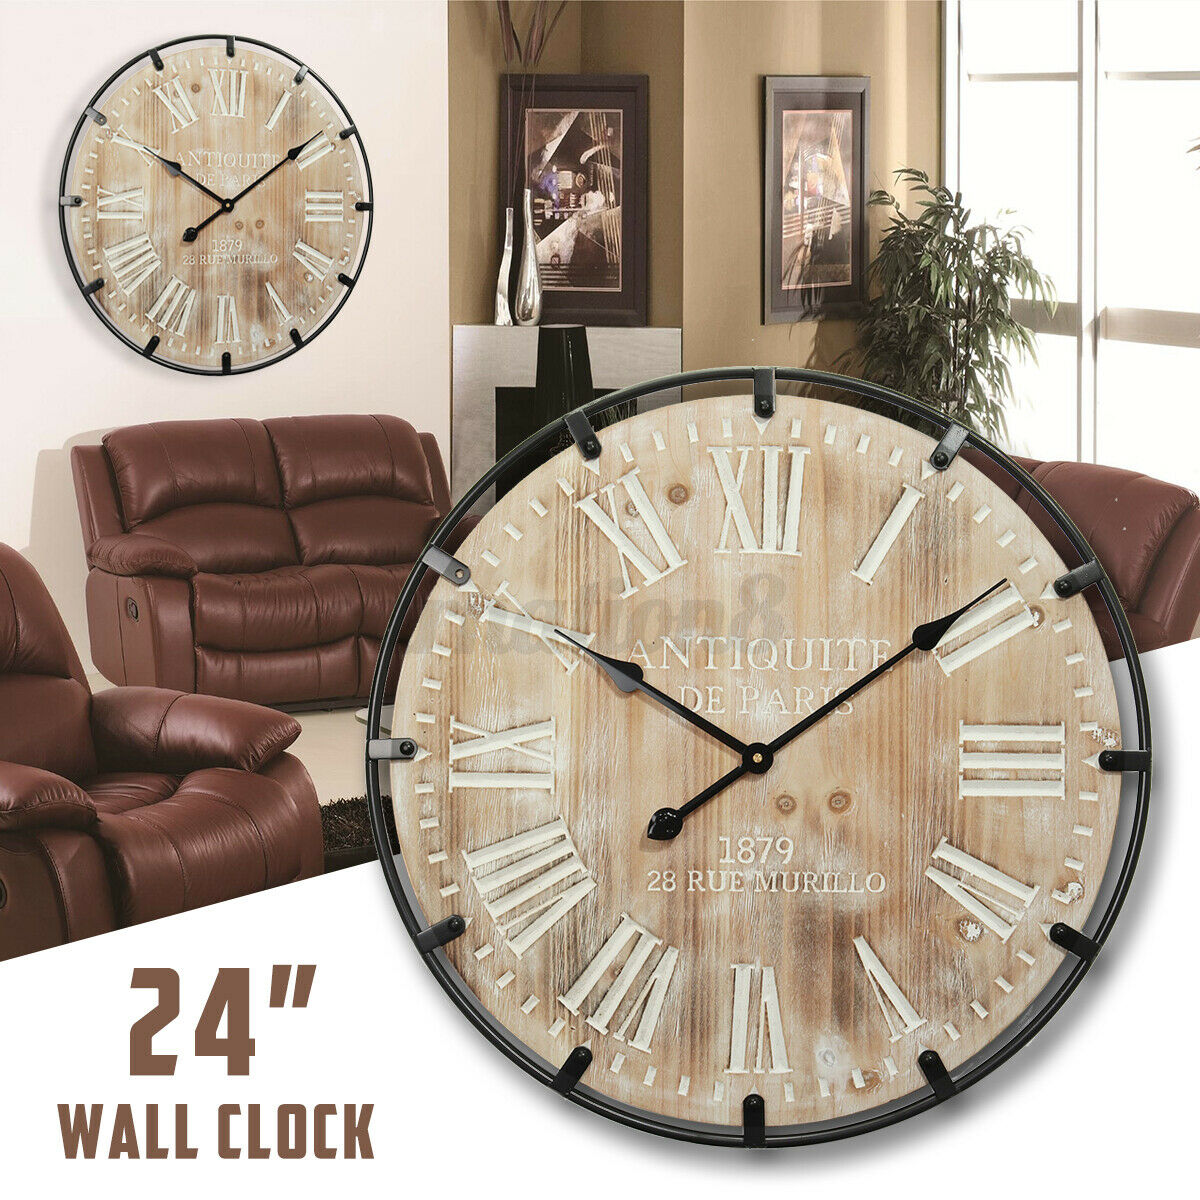 47cm//60cm Large Retro Black Iron Art Hollow Wall Clock Roman Numerals Home Decor